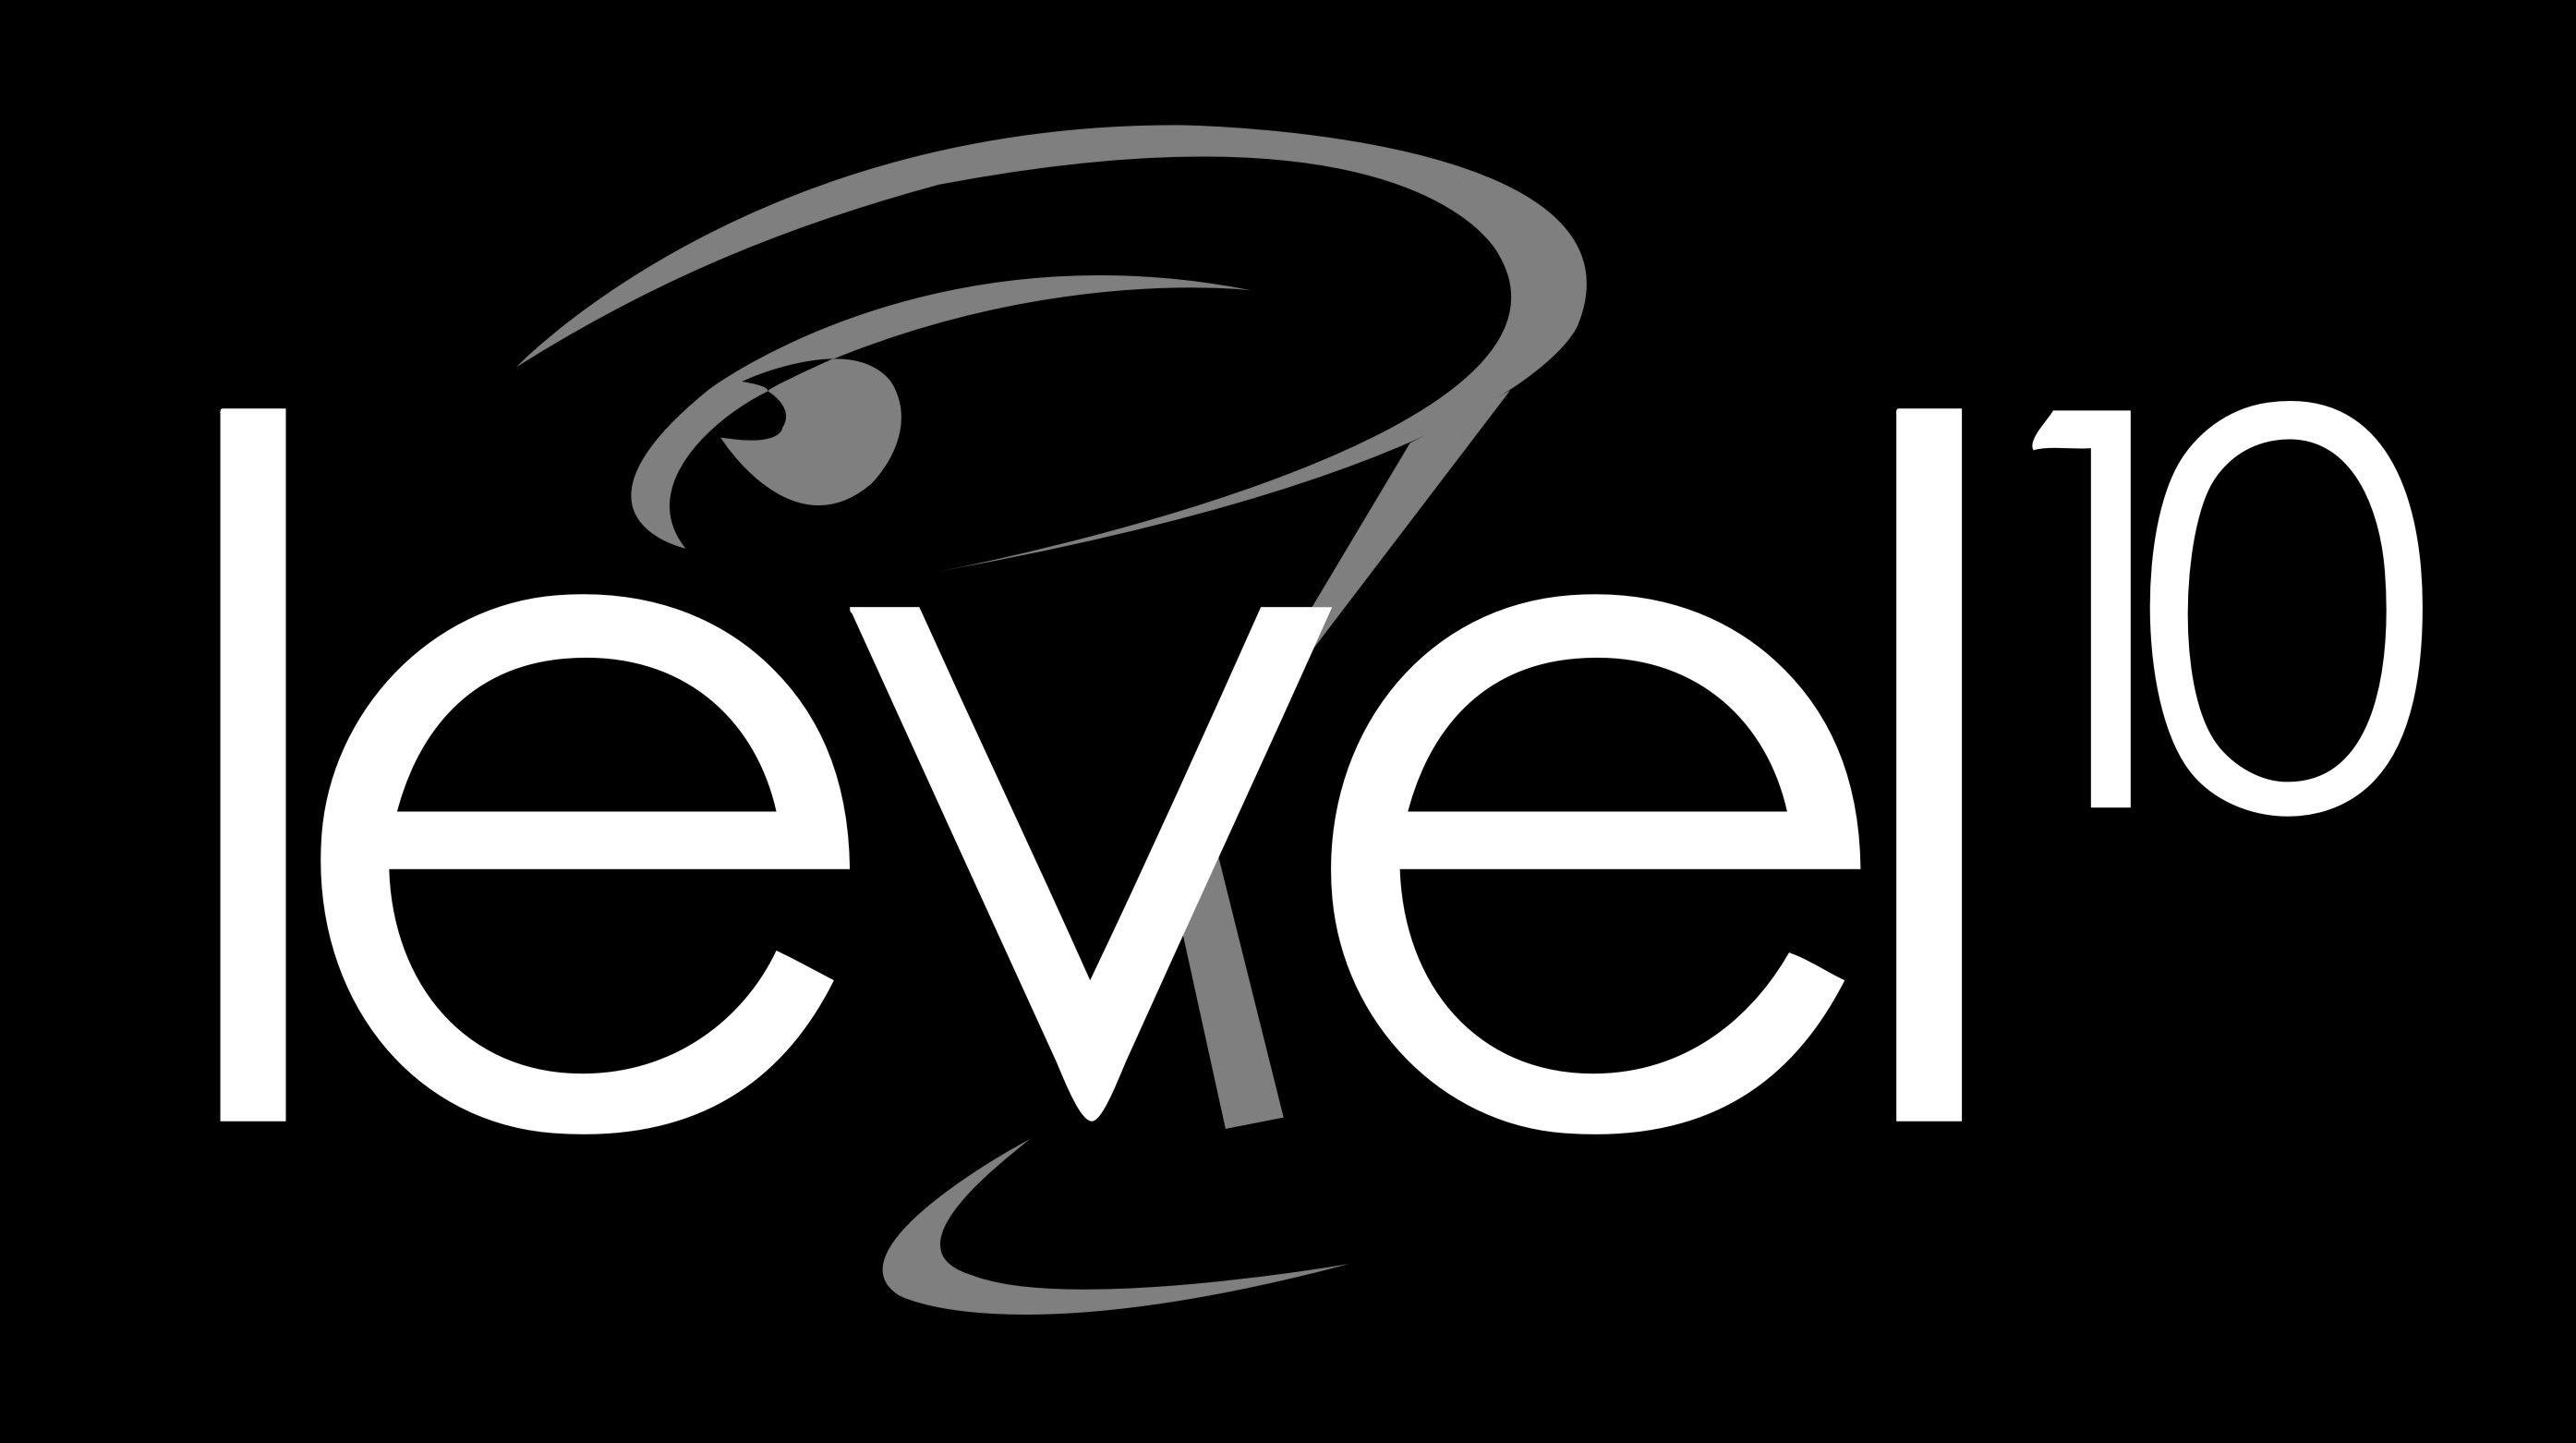 Level 10 Martini Lounge Vimeo Logo Company Logo Logos